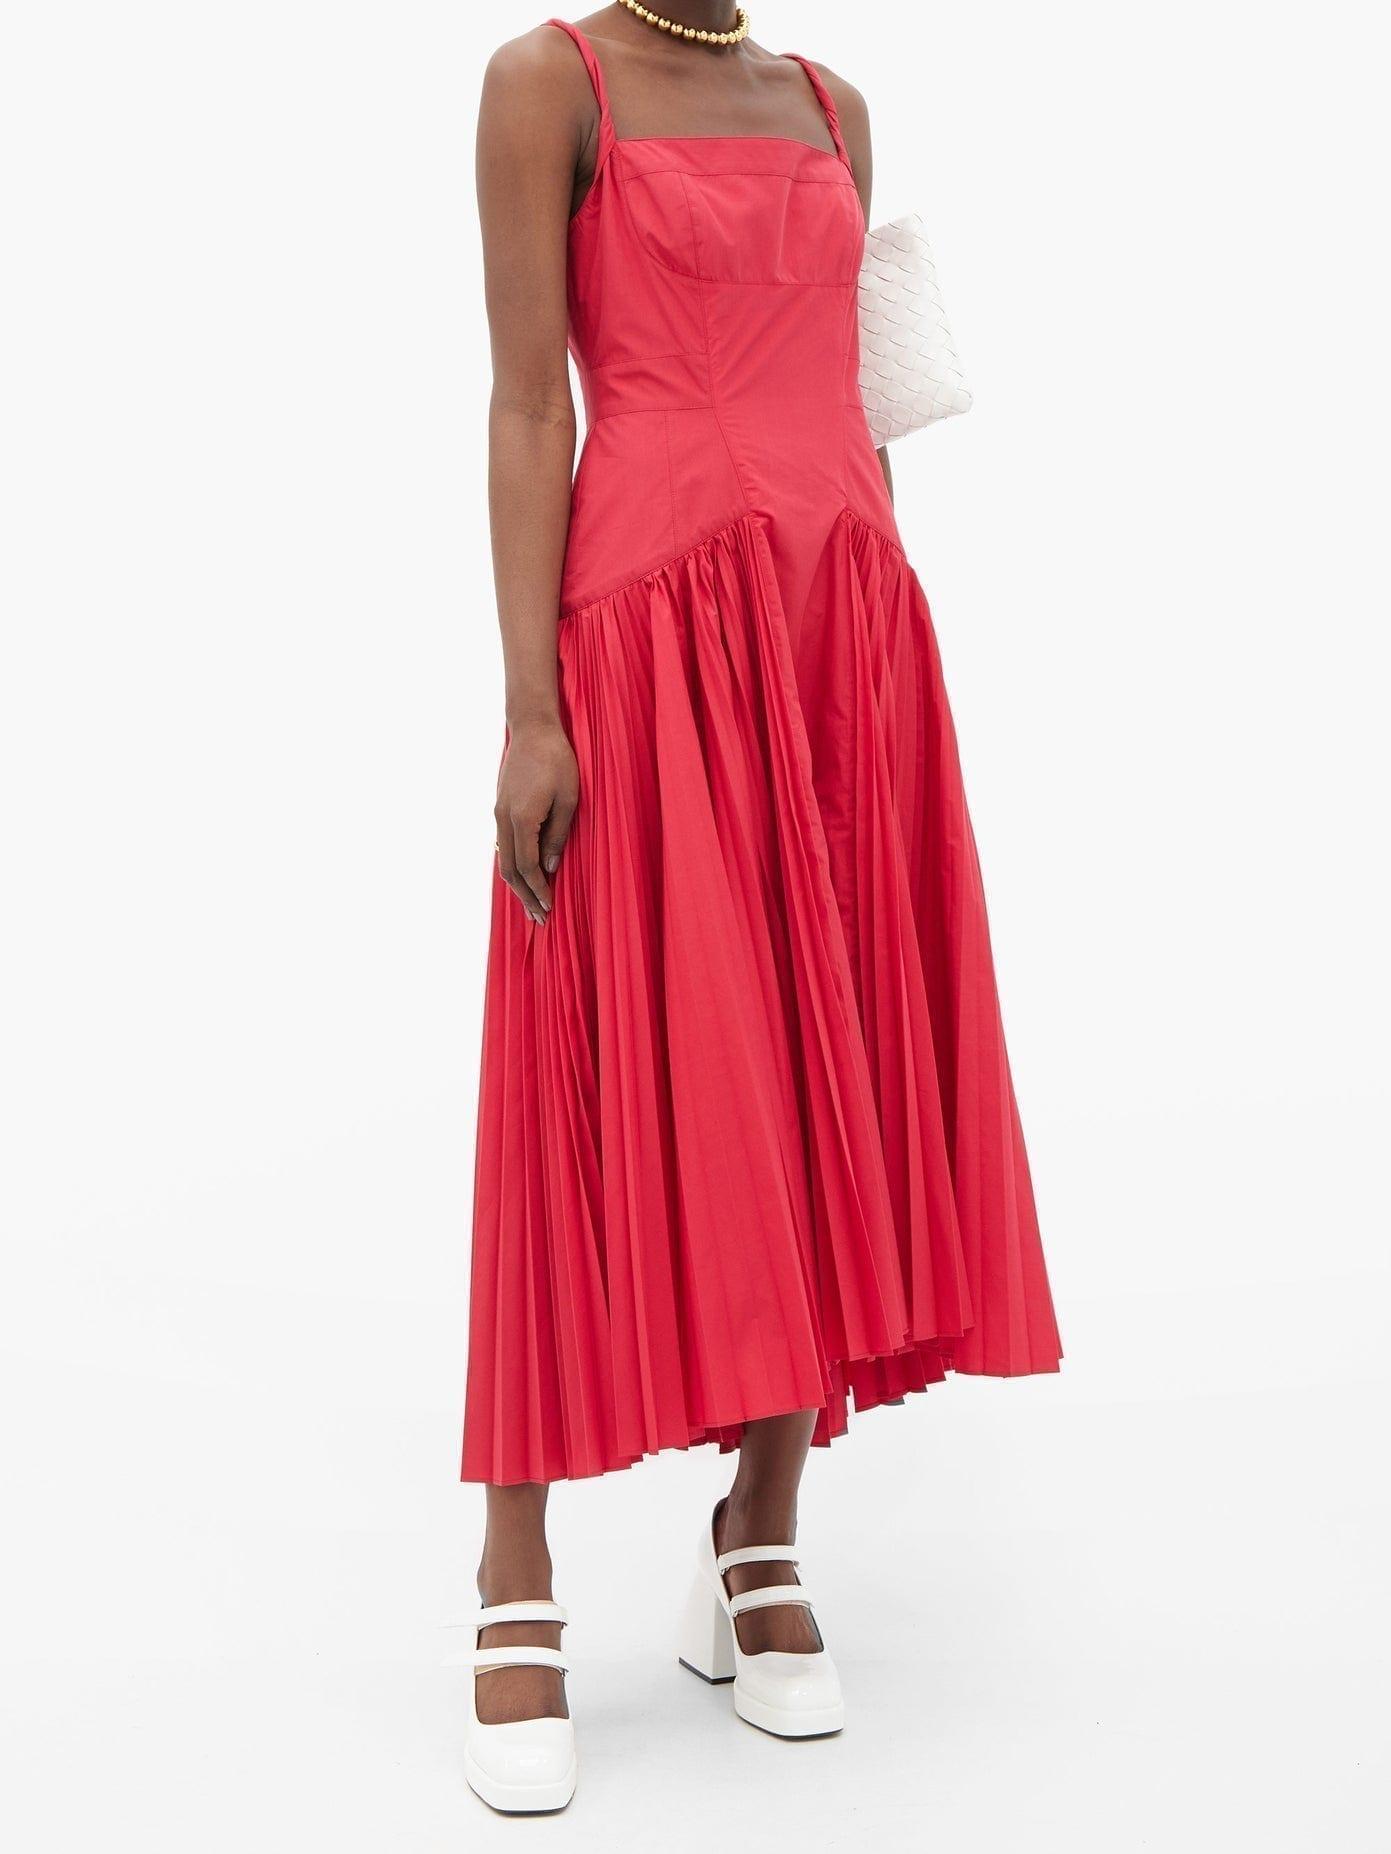 PROENZA SCHOULER Twisted-strap Pleated Cotton-blend Midi Dress